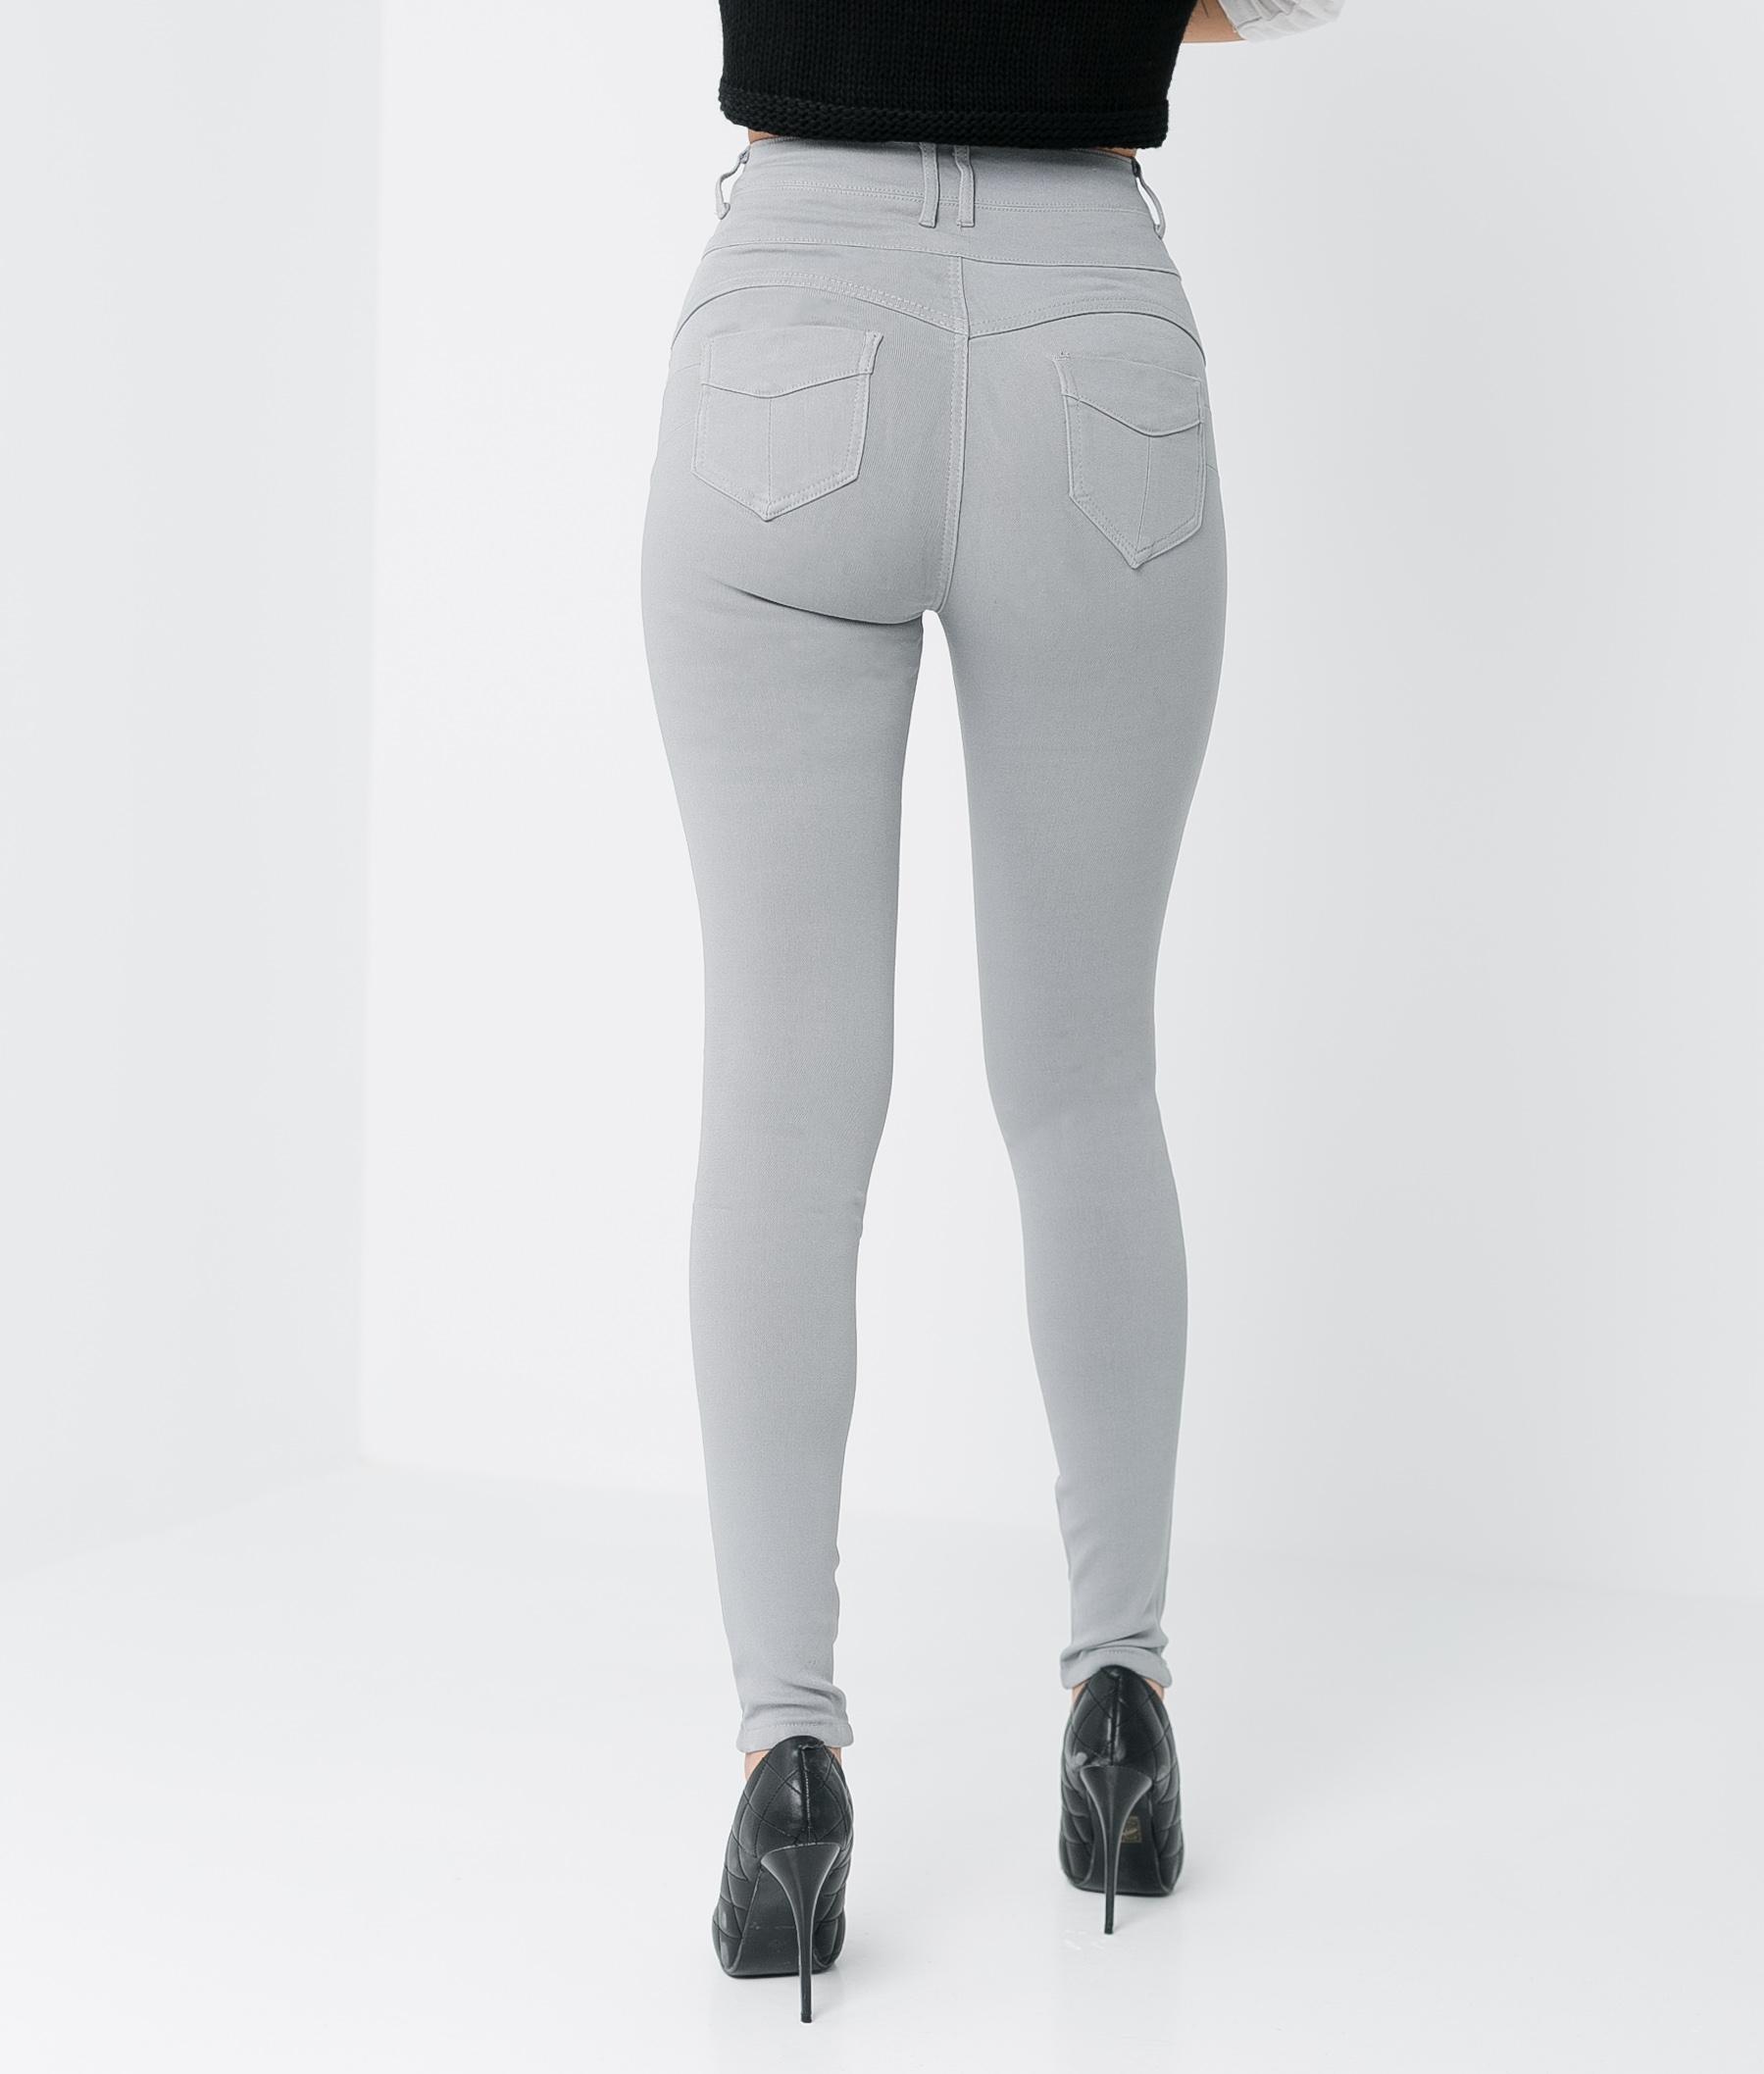 Pantalón Subama - Gris